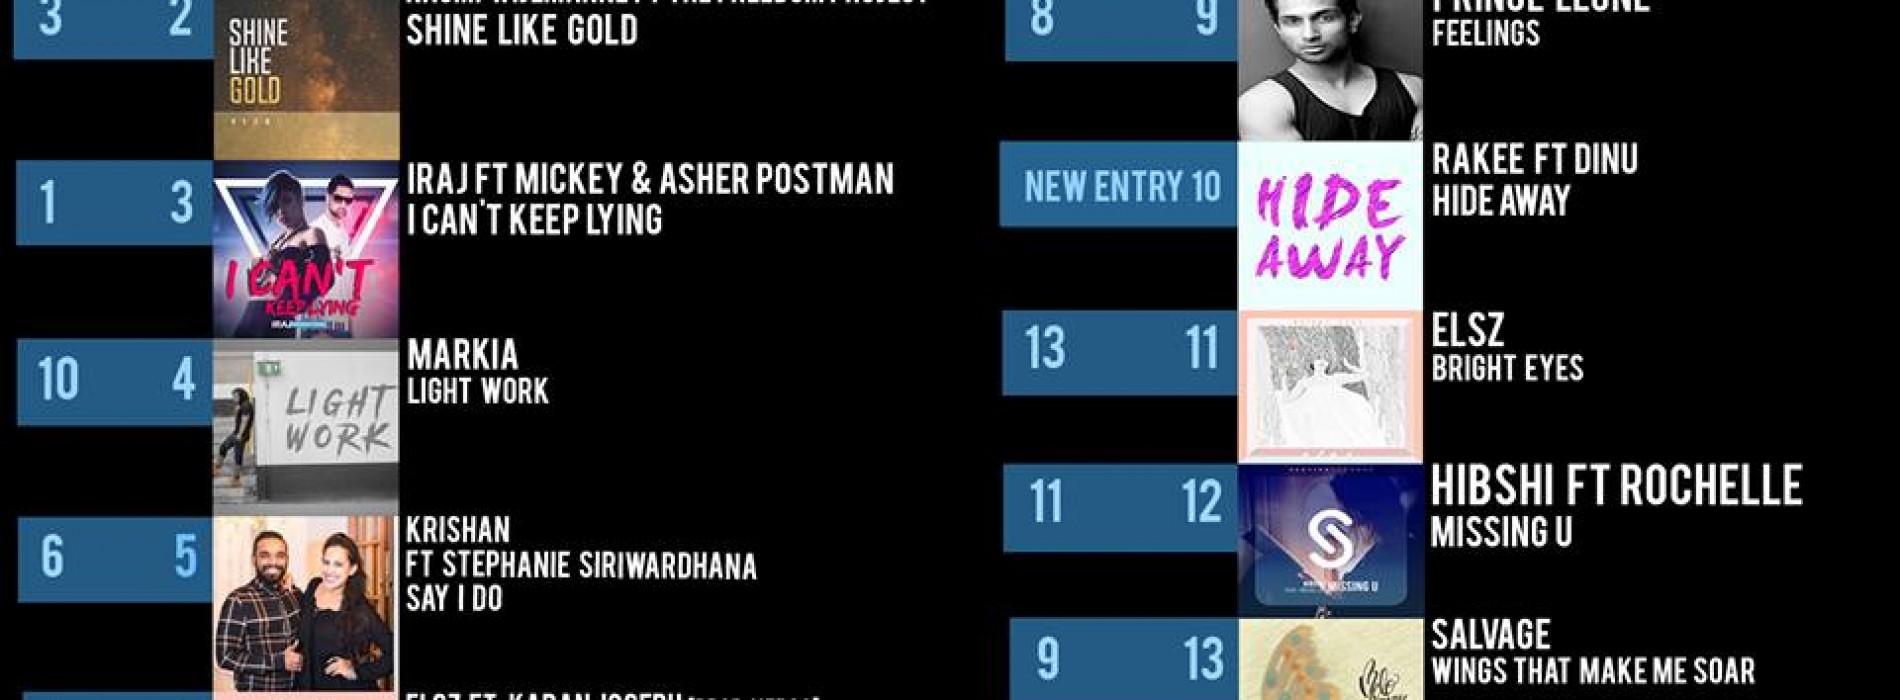 Hibshi & Leah Hit Number 1 Again!